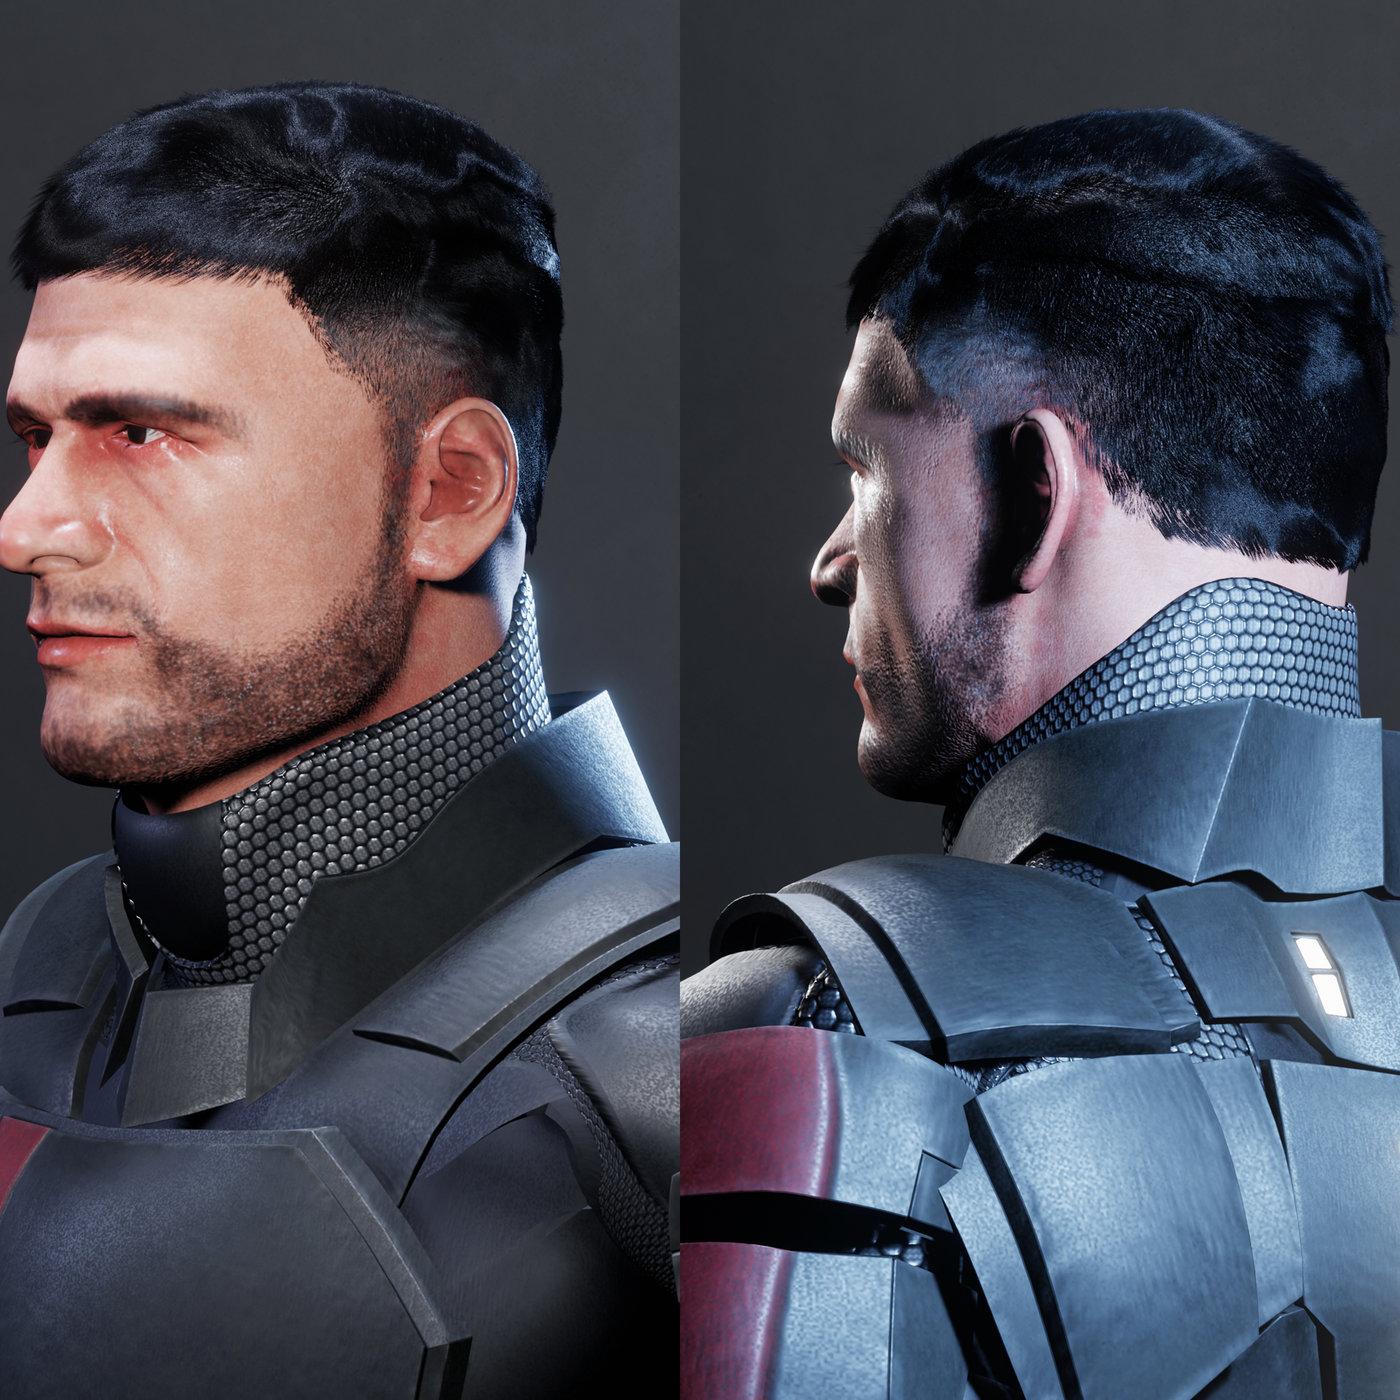 Soldier Suit / The Exigency's Kyle Burton